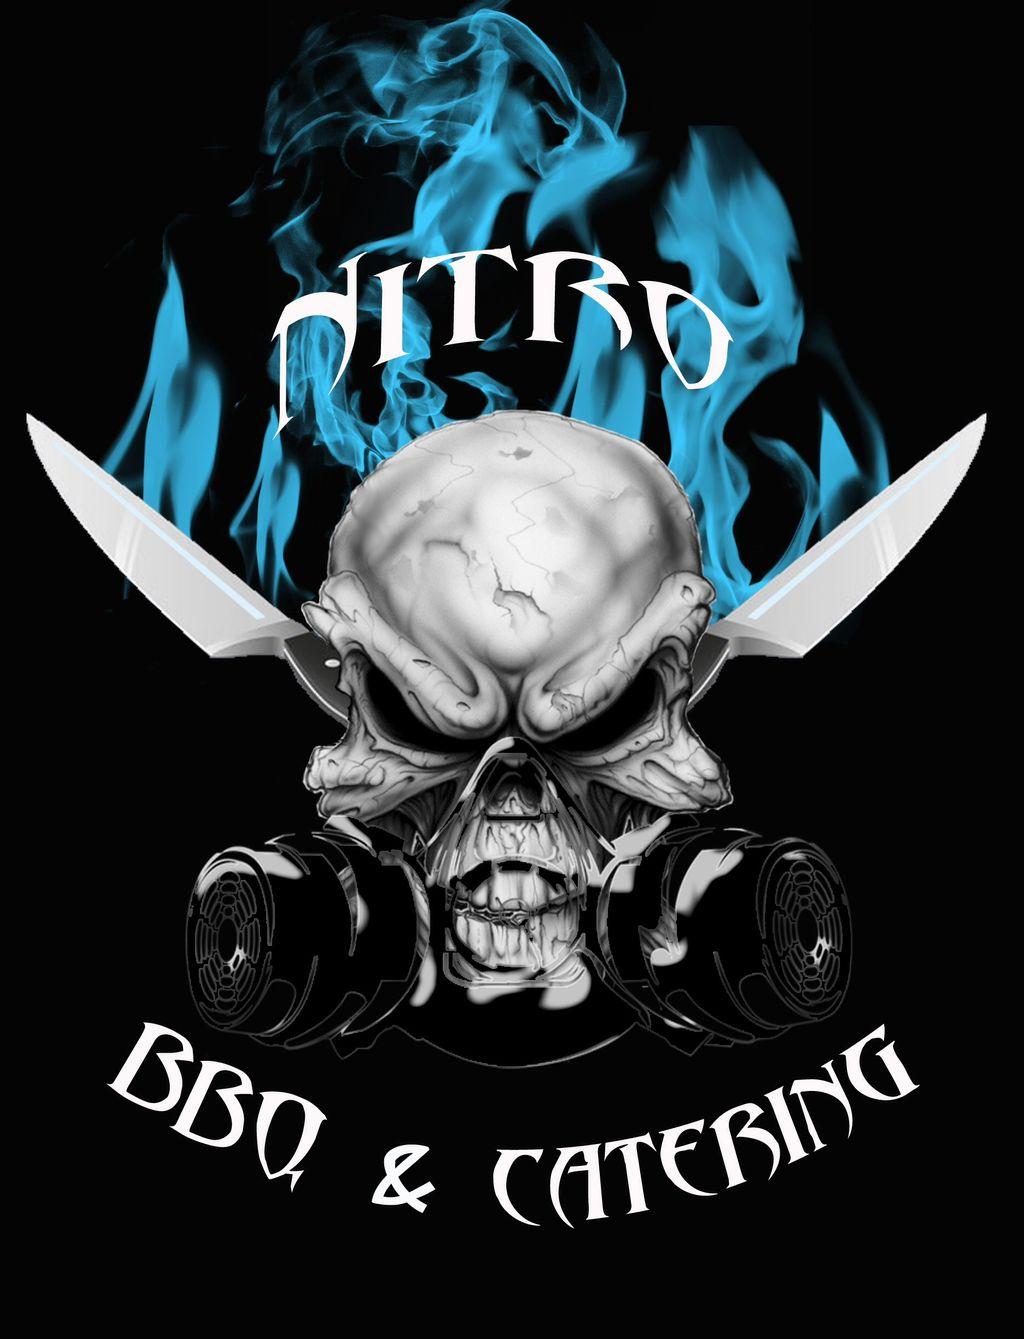 Nitro BBQ & Catering